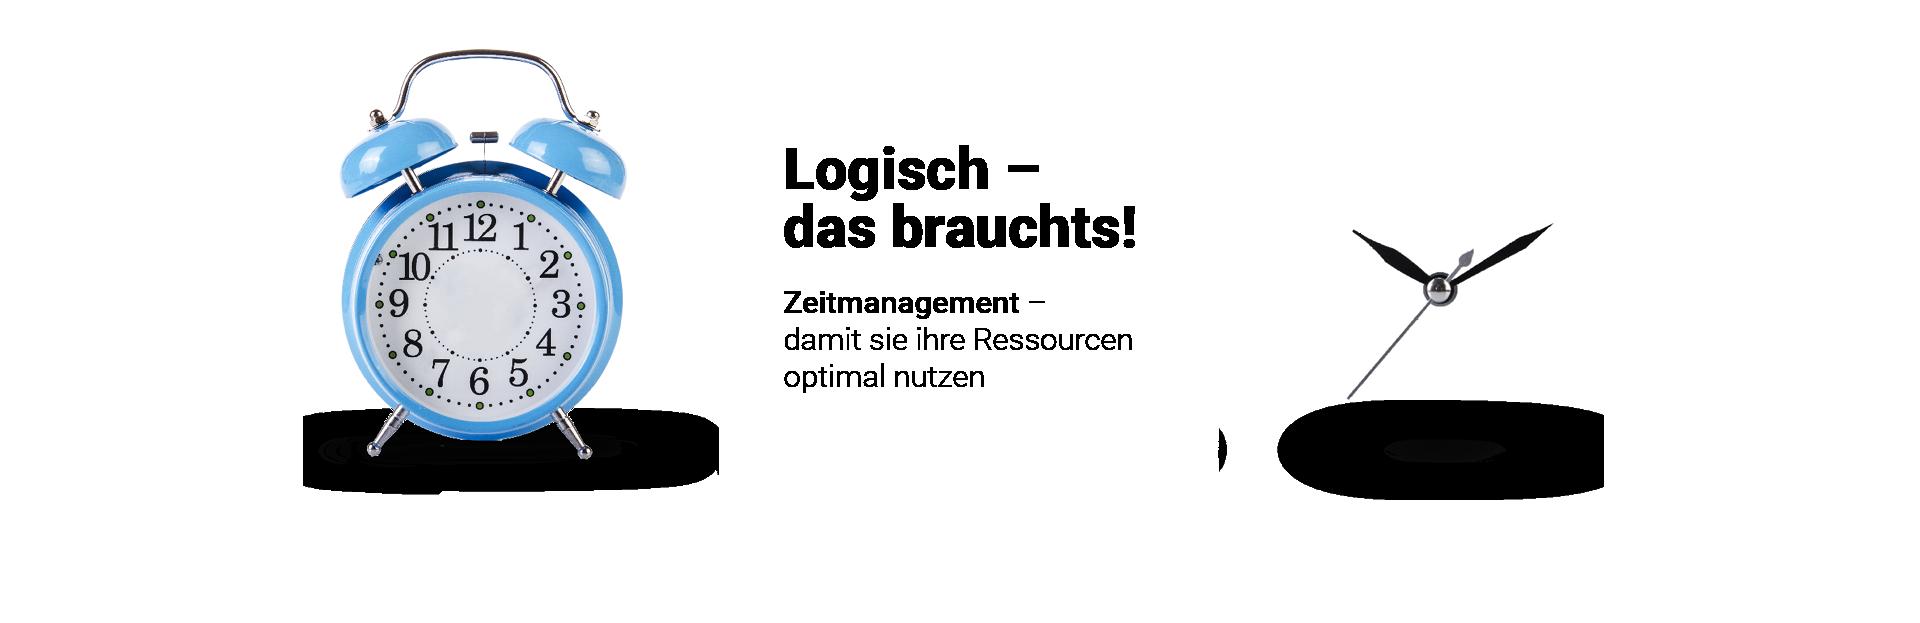 Slider-Bild